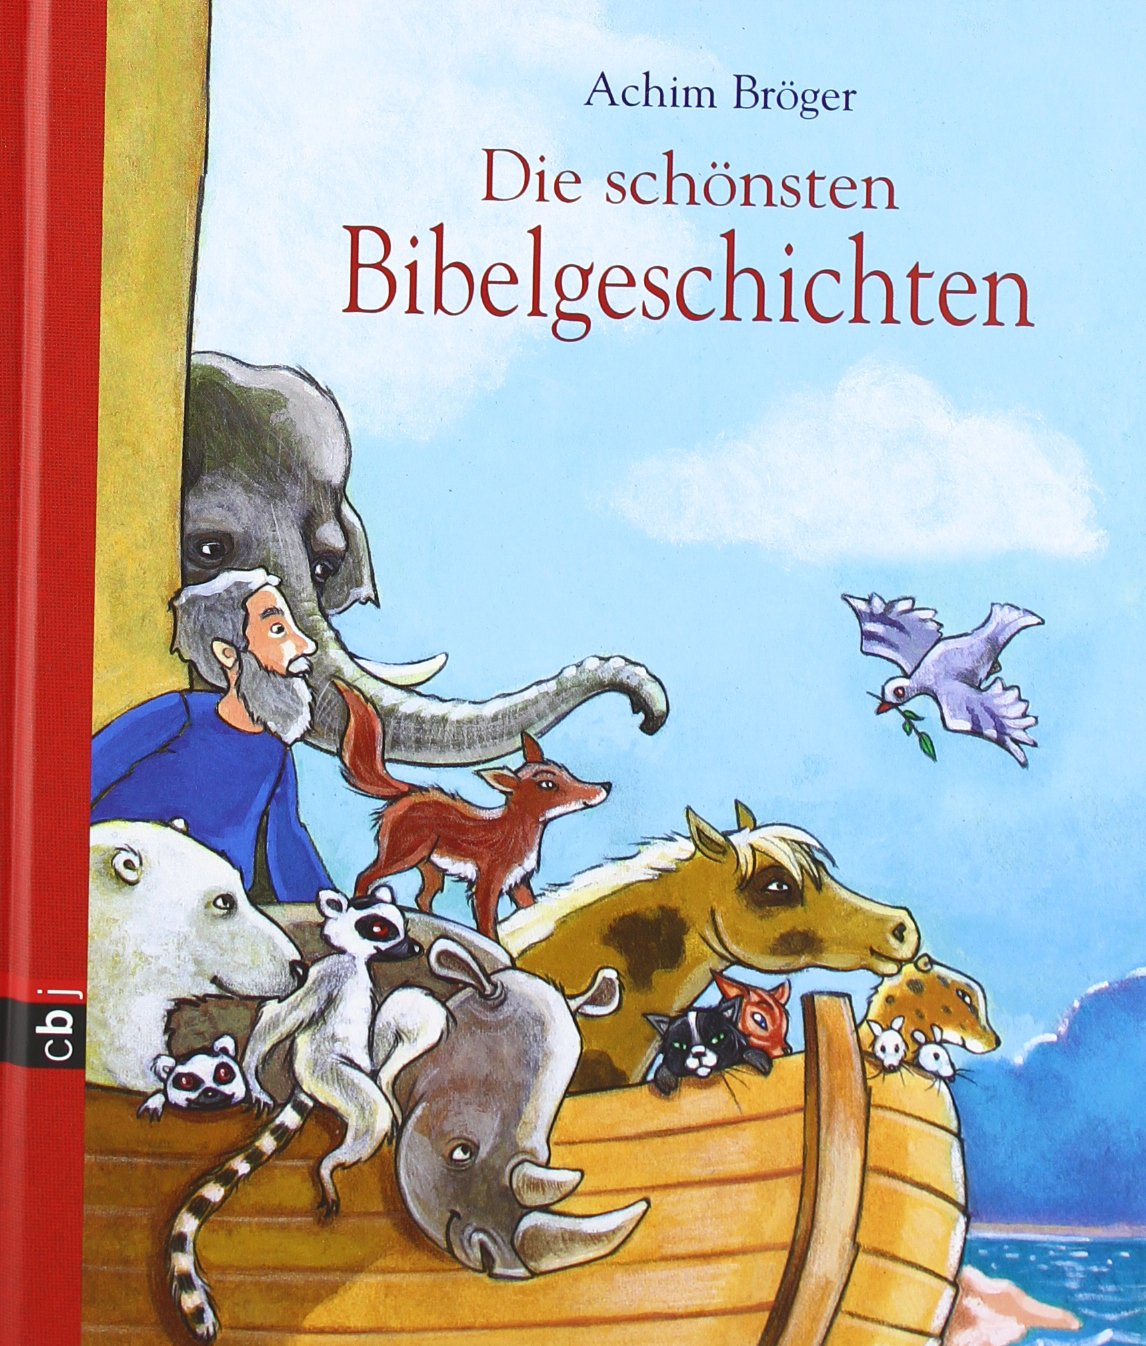 Die schönsten Bibelgeschichten